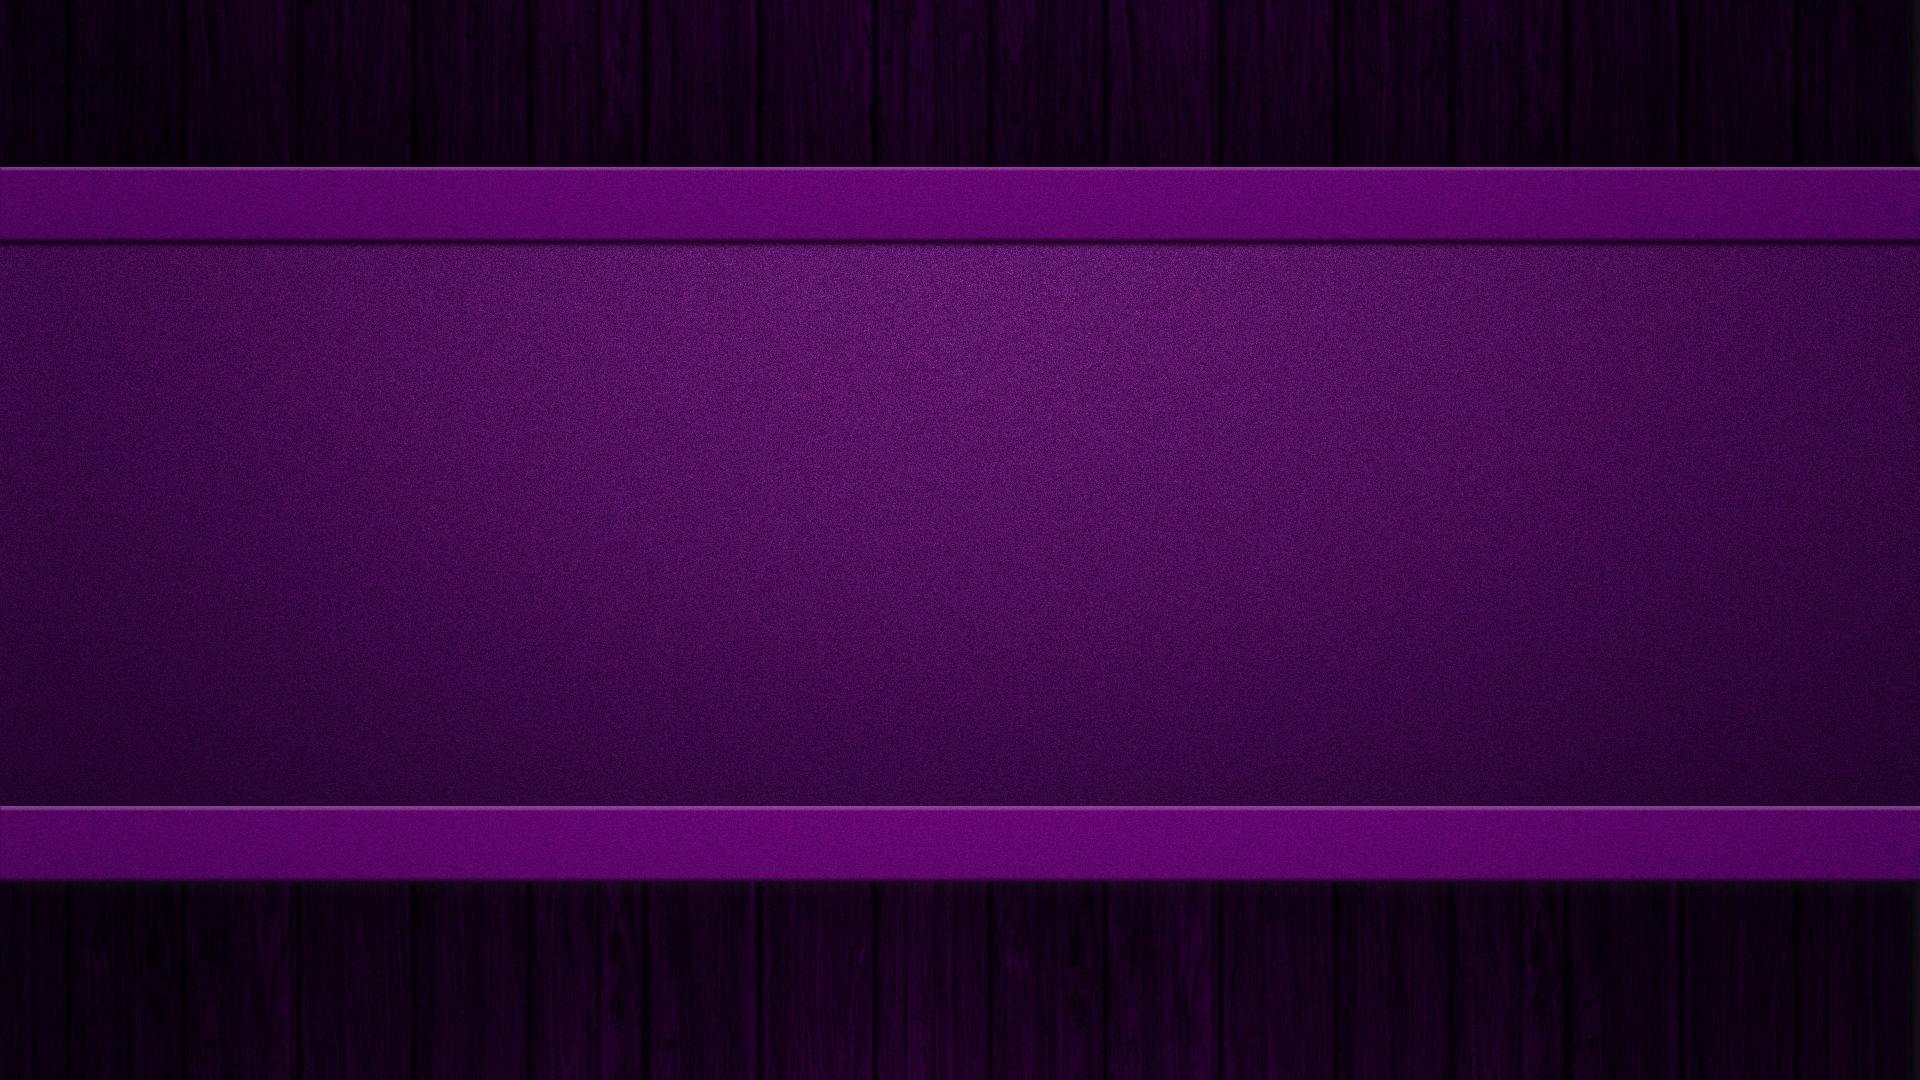 Download Wallpaper Texture Stripes Purple